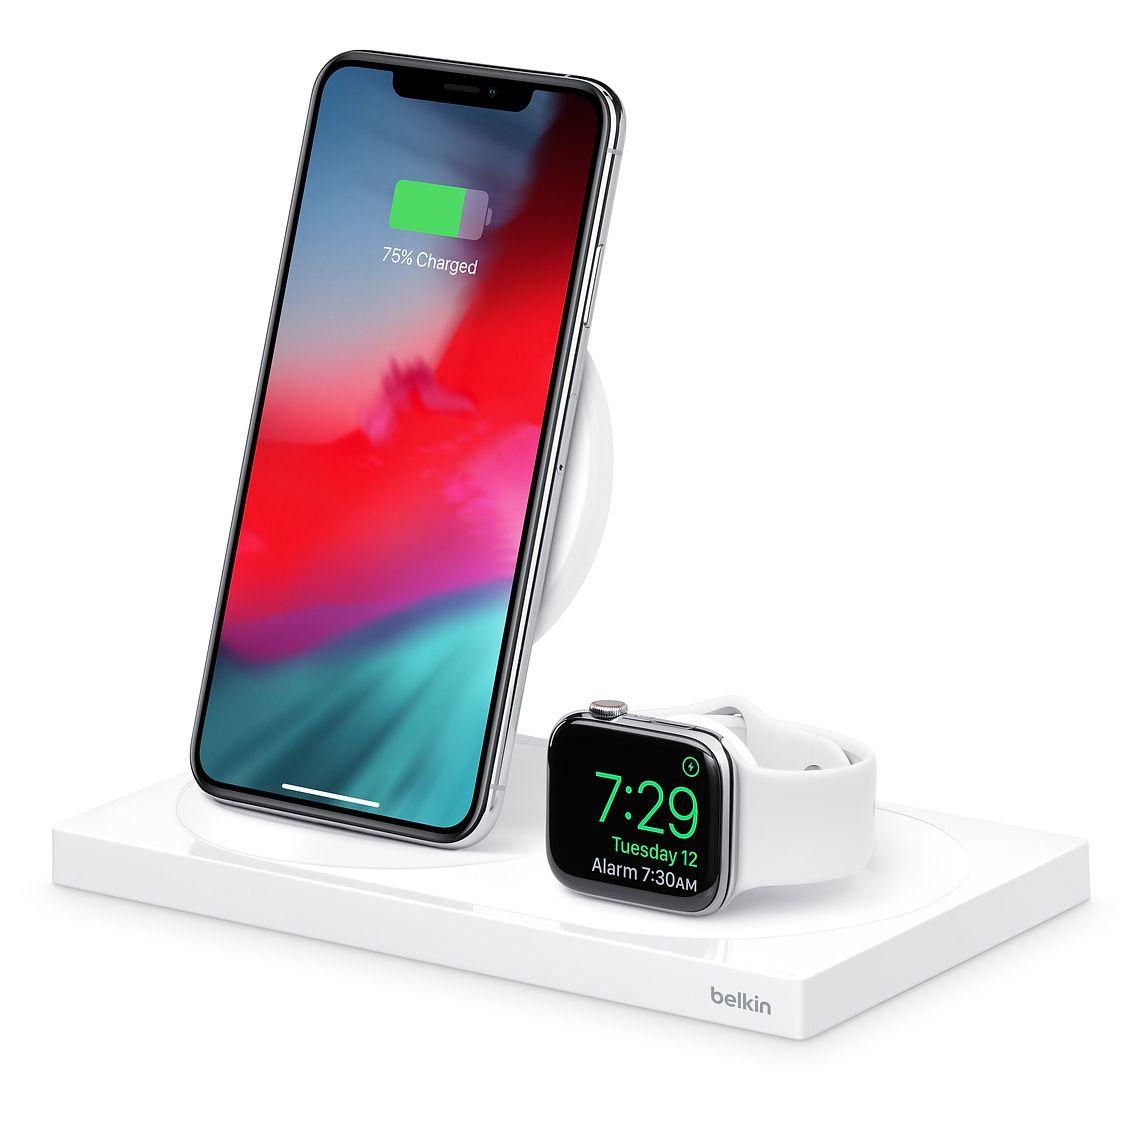 Belkin boost up wireless charging dock for iphone apple